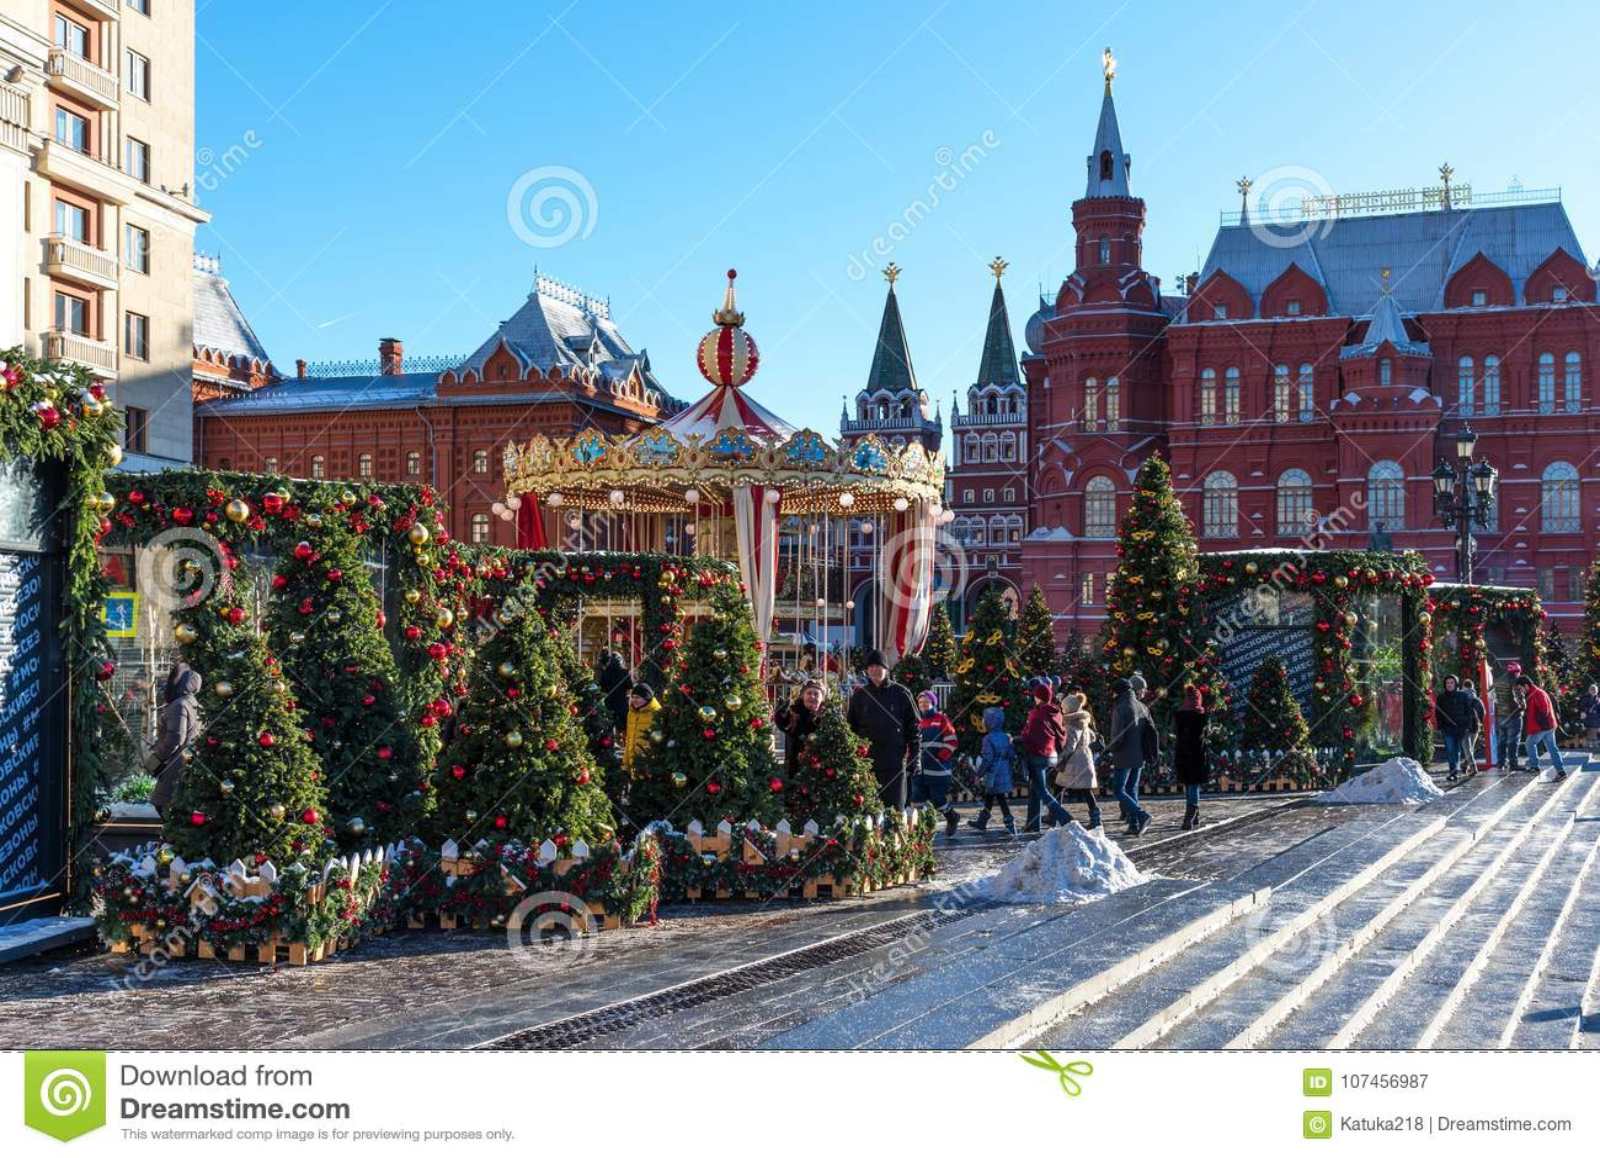 Festival Journey to Christmas 2018 81